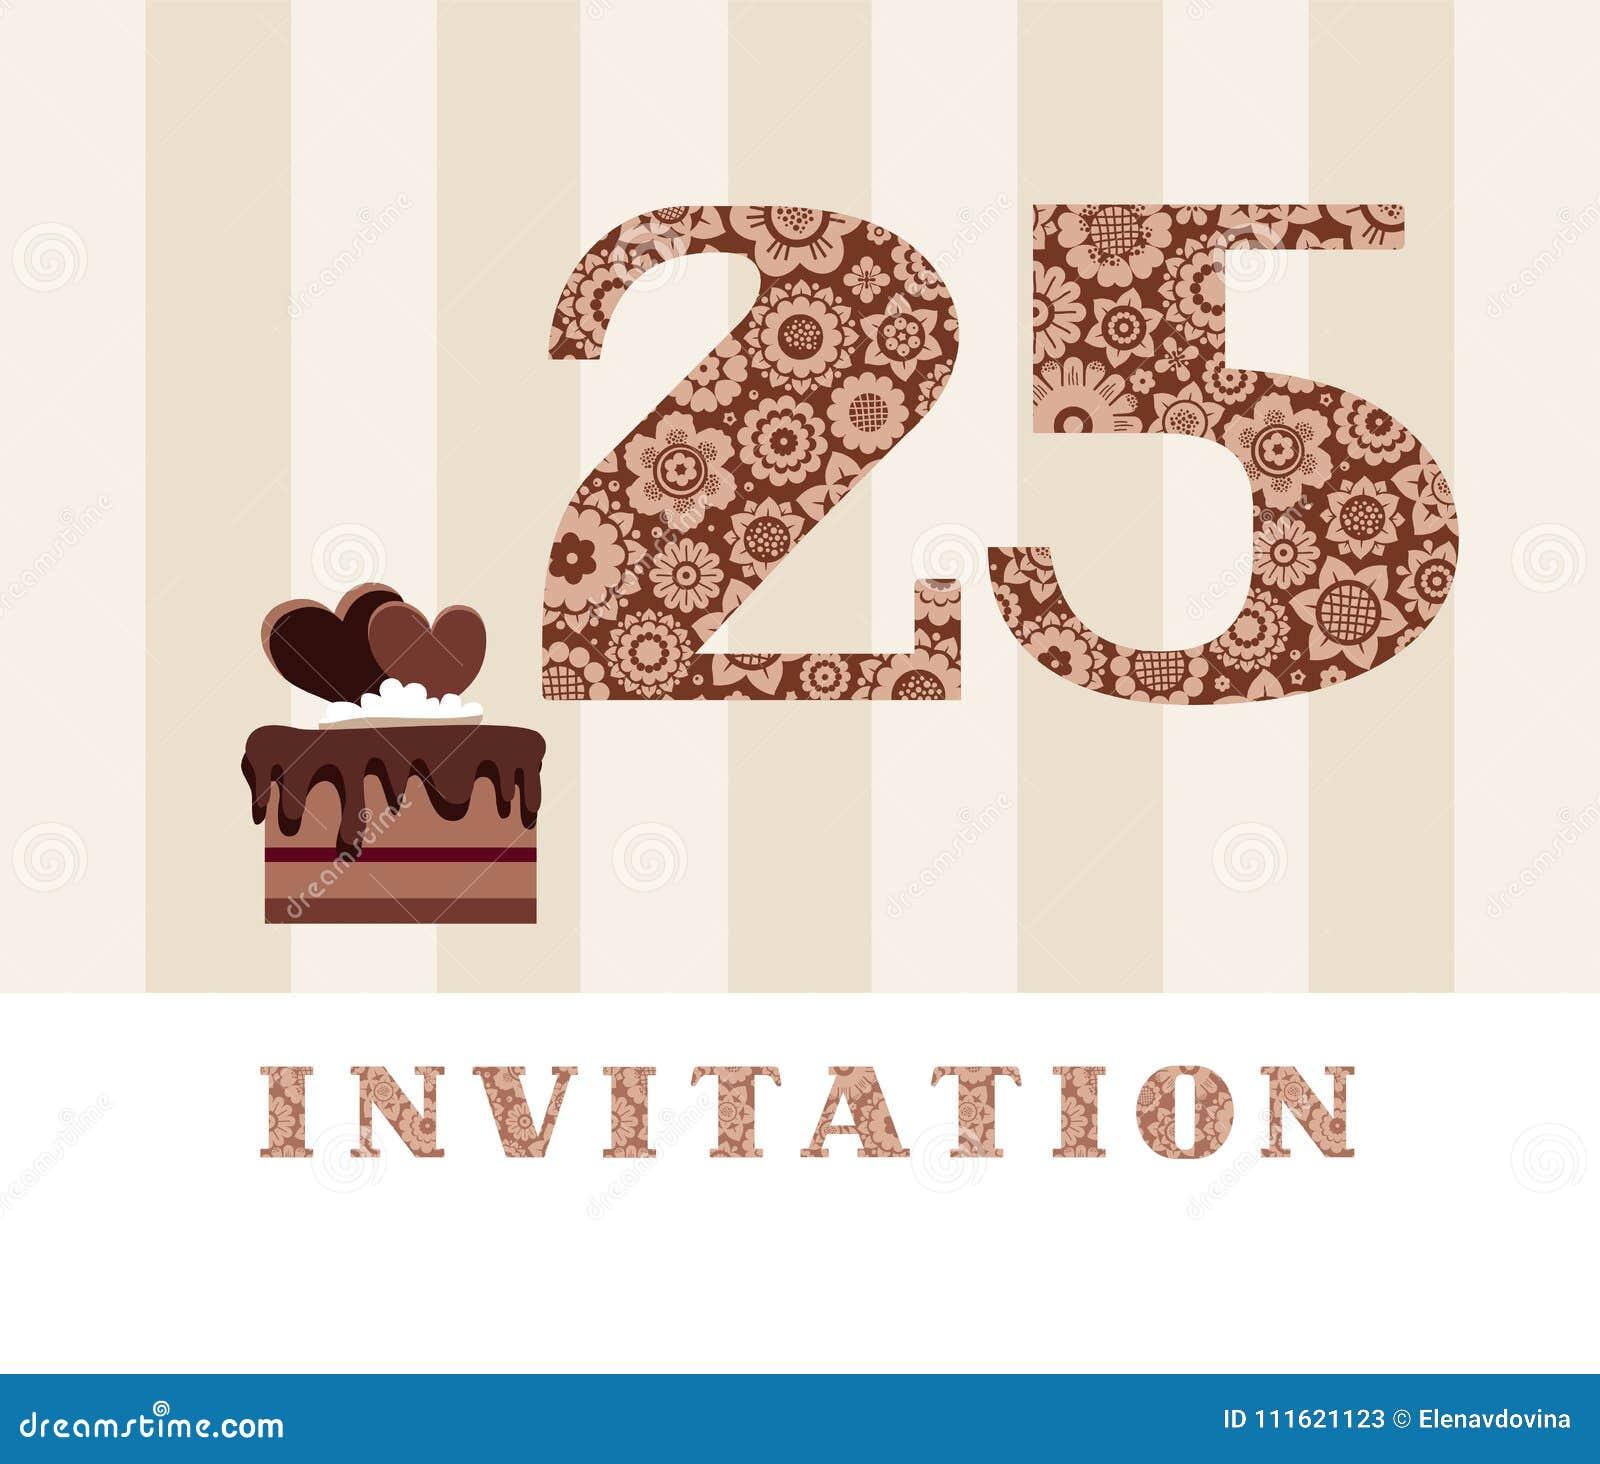 Invitation 25 Years Old Chocolate Cake Heart Vector Stock